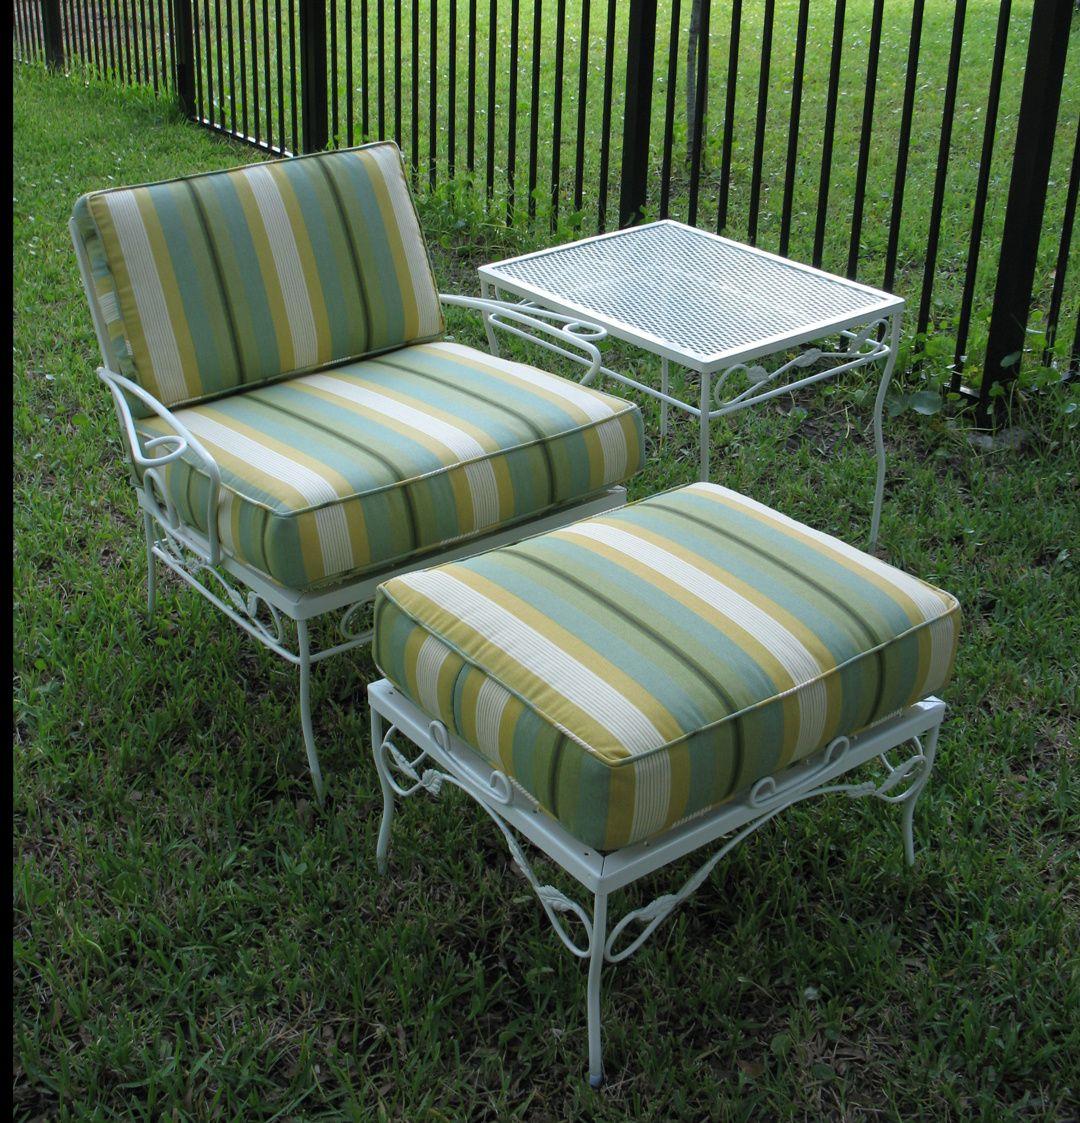 Custom Outdoor Furniture Cushions - Best Home Office Furniture Check more  at http:// - Custom Outdoor Furniture Cushions - Best Home Office Furniture Check